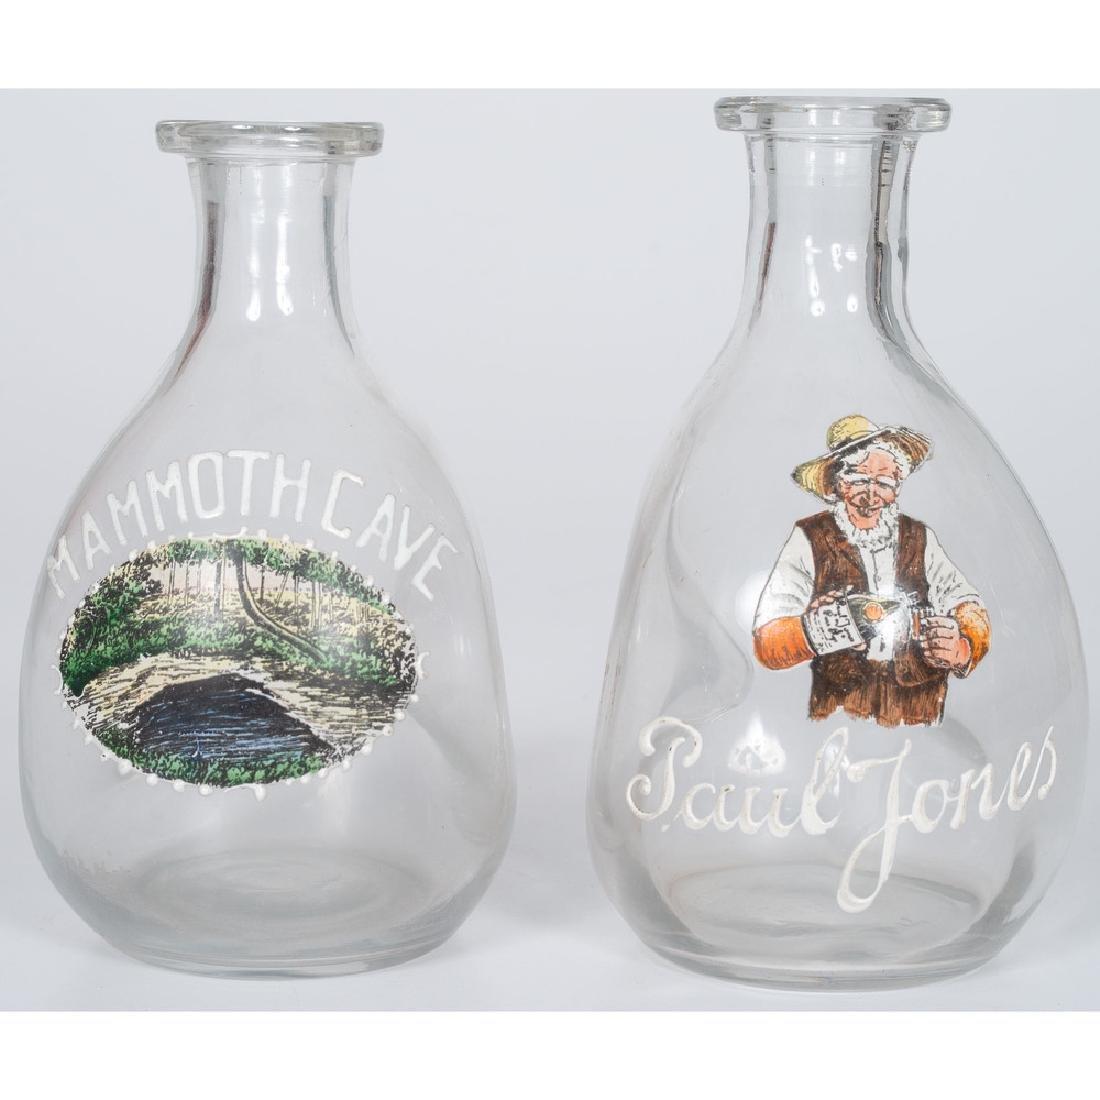 Glass Pinch Bottles, Mammoth Cave and Paul Jones